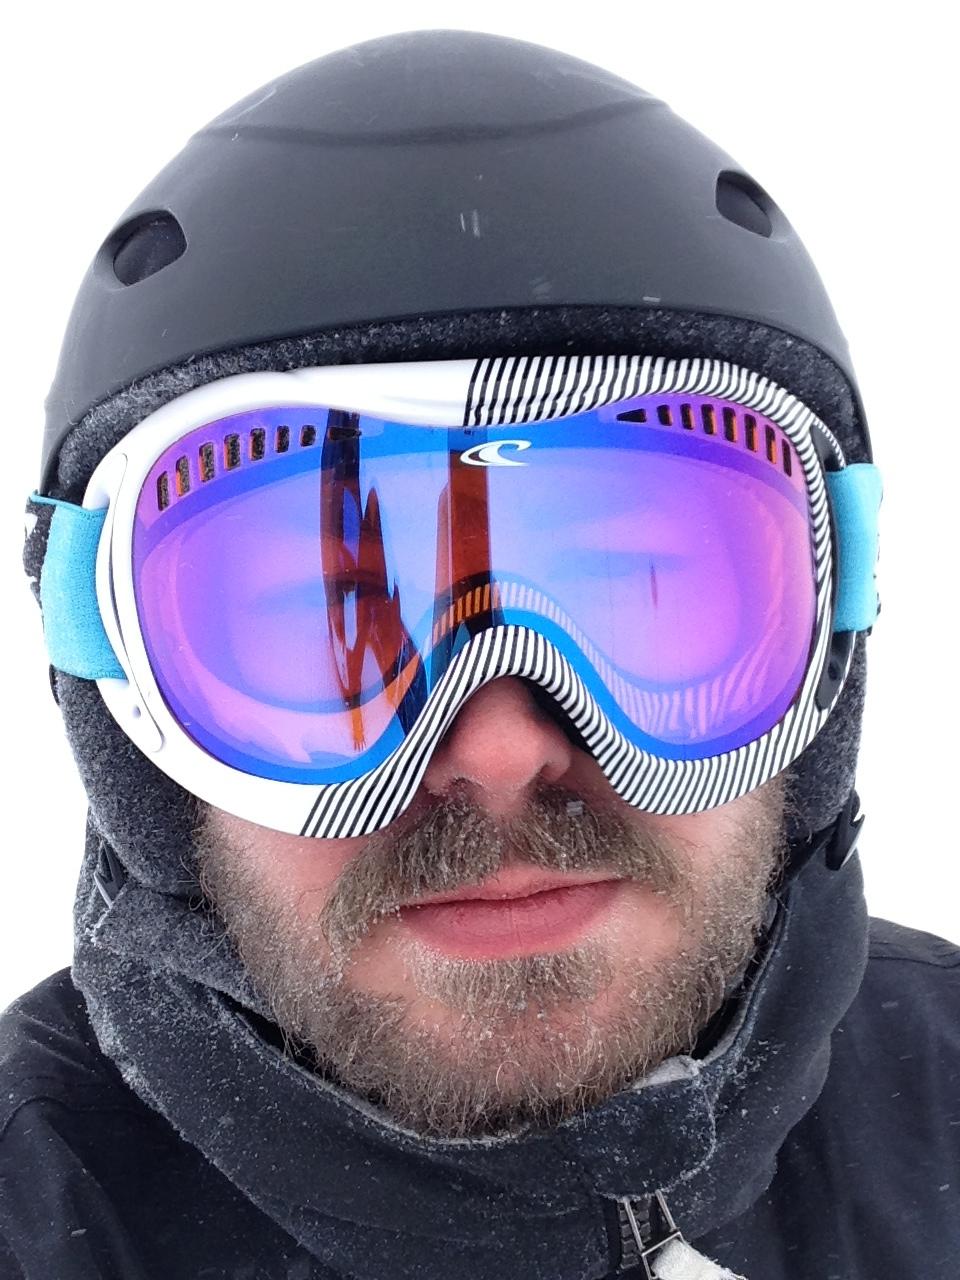 Frozen beard in snowy, -13° C conditions.